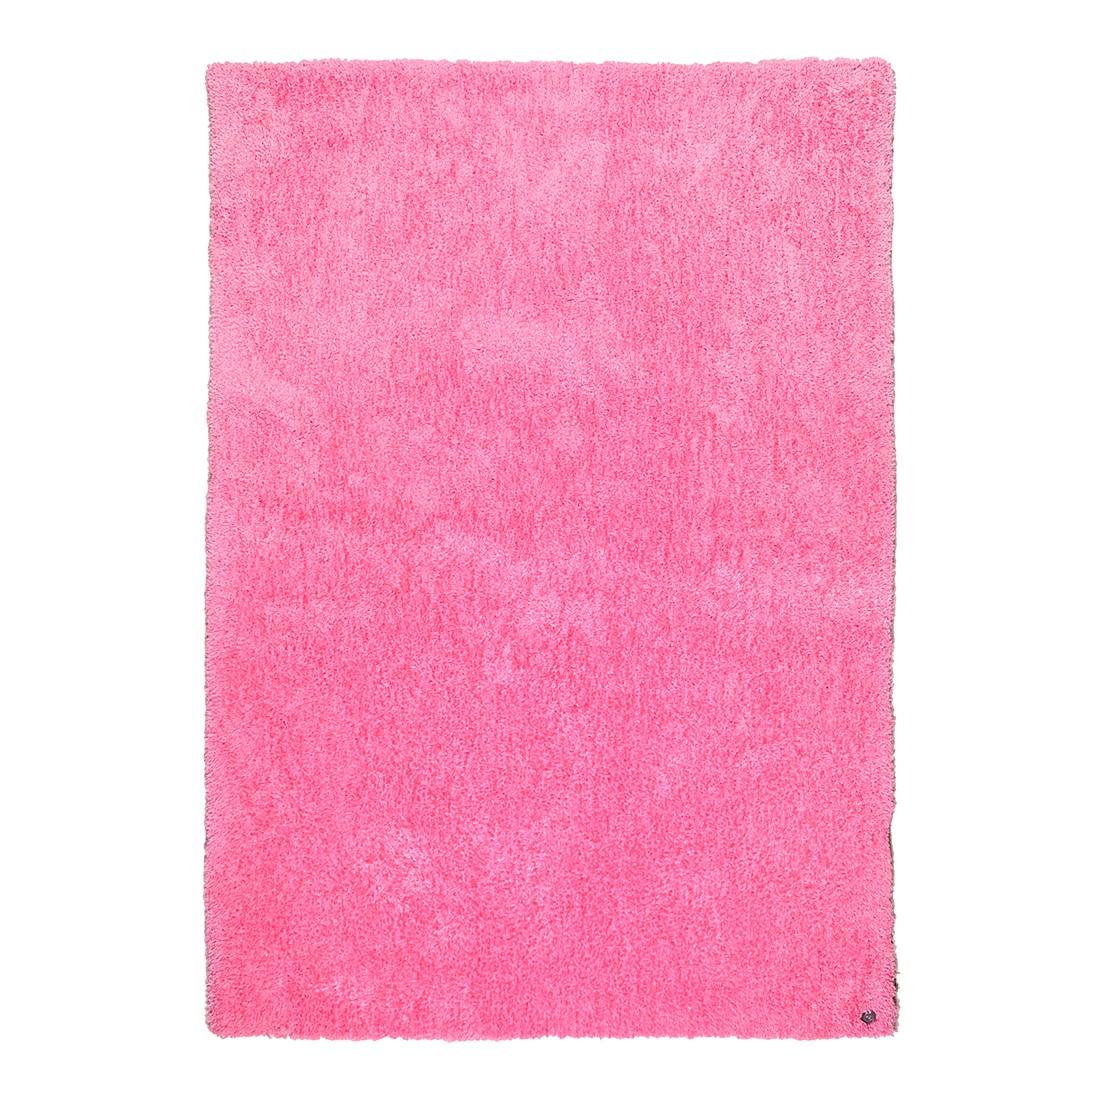 Tapijt Soft Square - roze - maat: 190x190cm, Tom Tailor